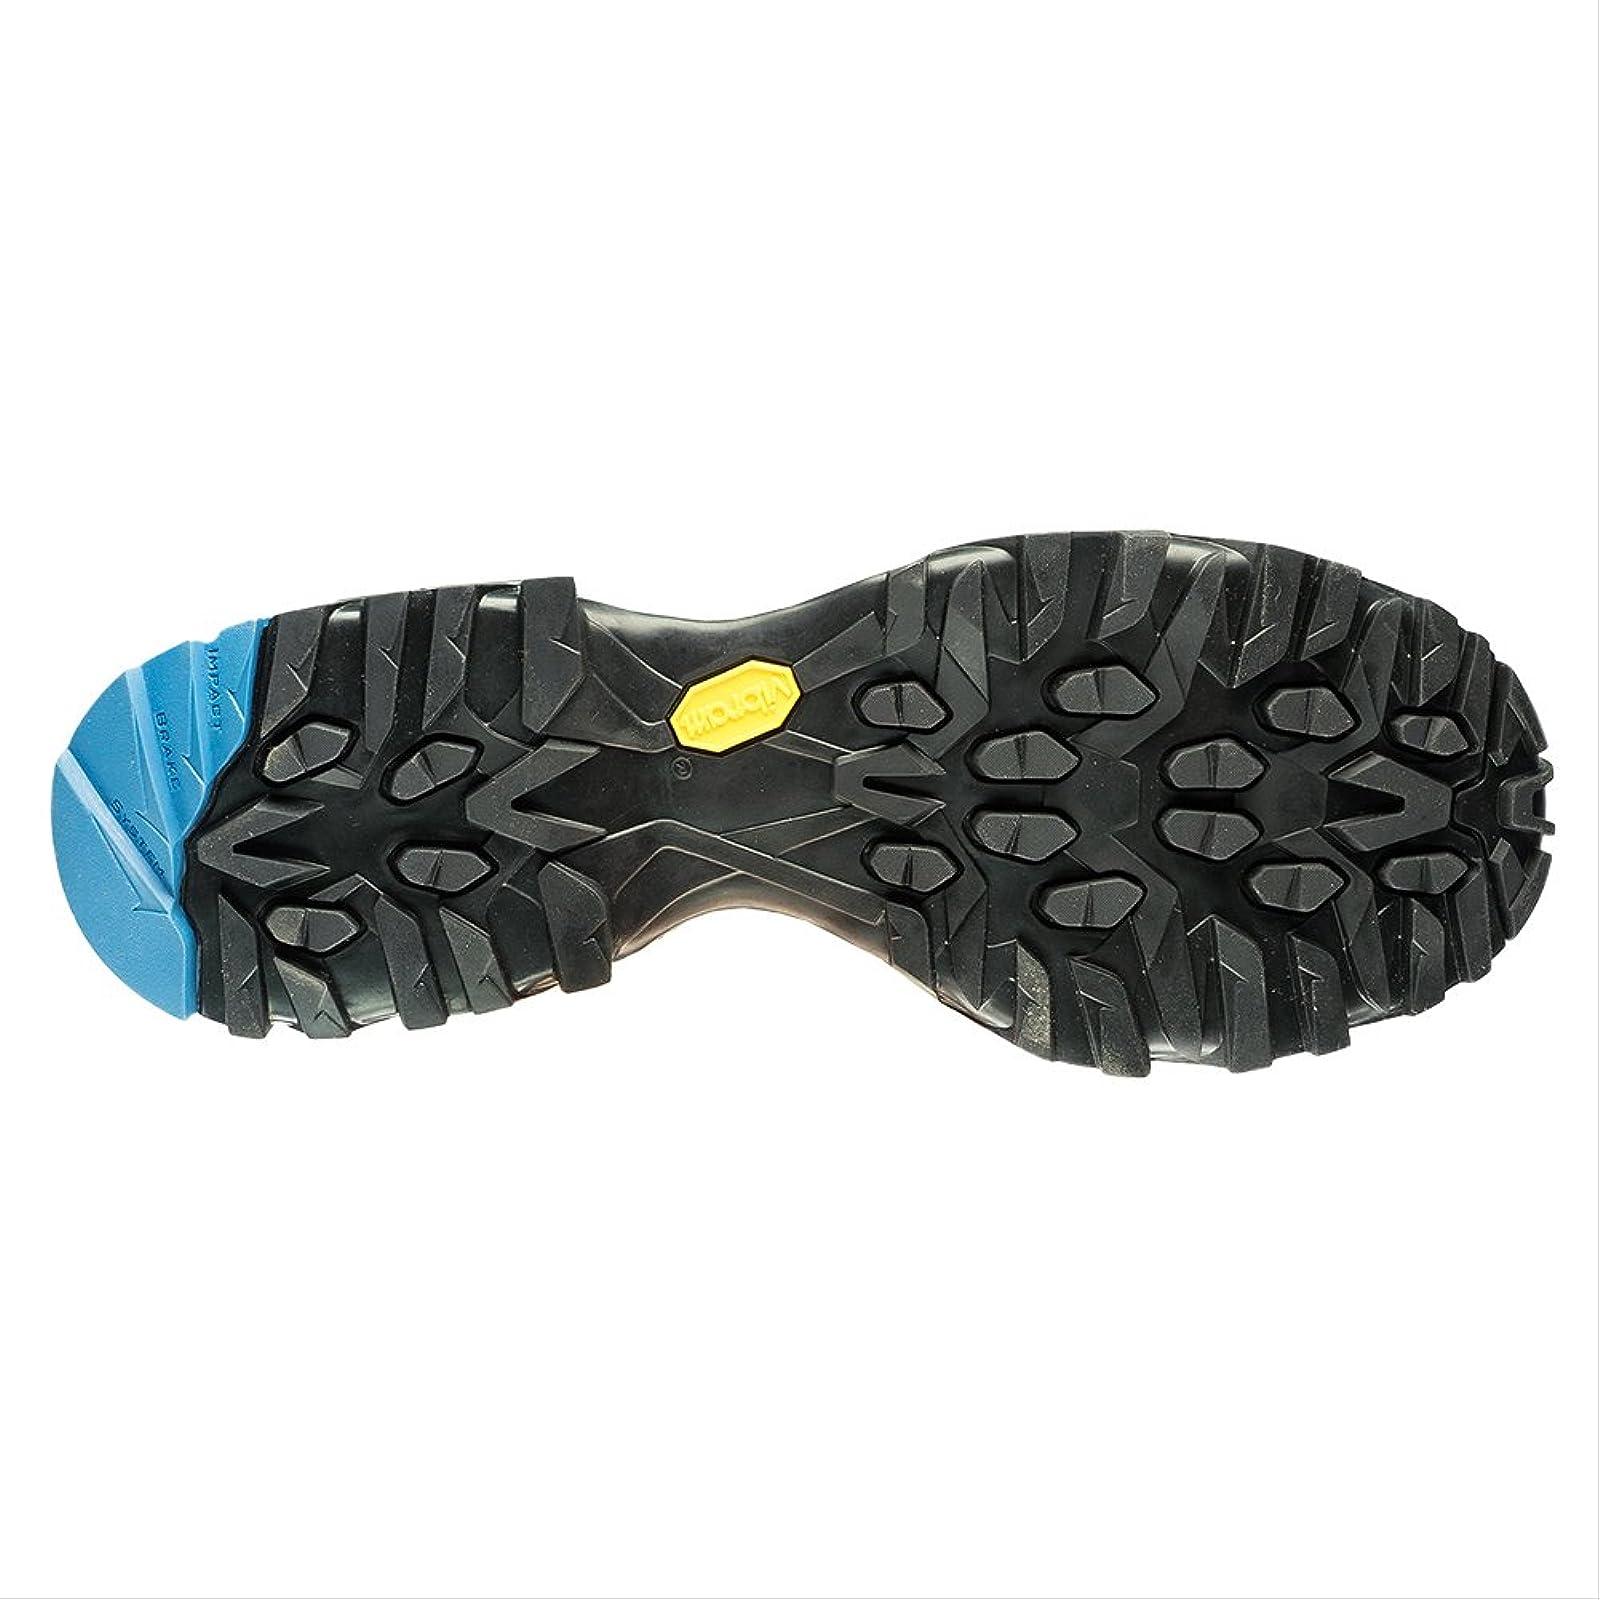 3f20f95dbe9 La Sportiva Men's Core High GTX Trail Hiking Boot 14R